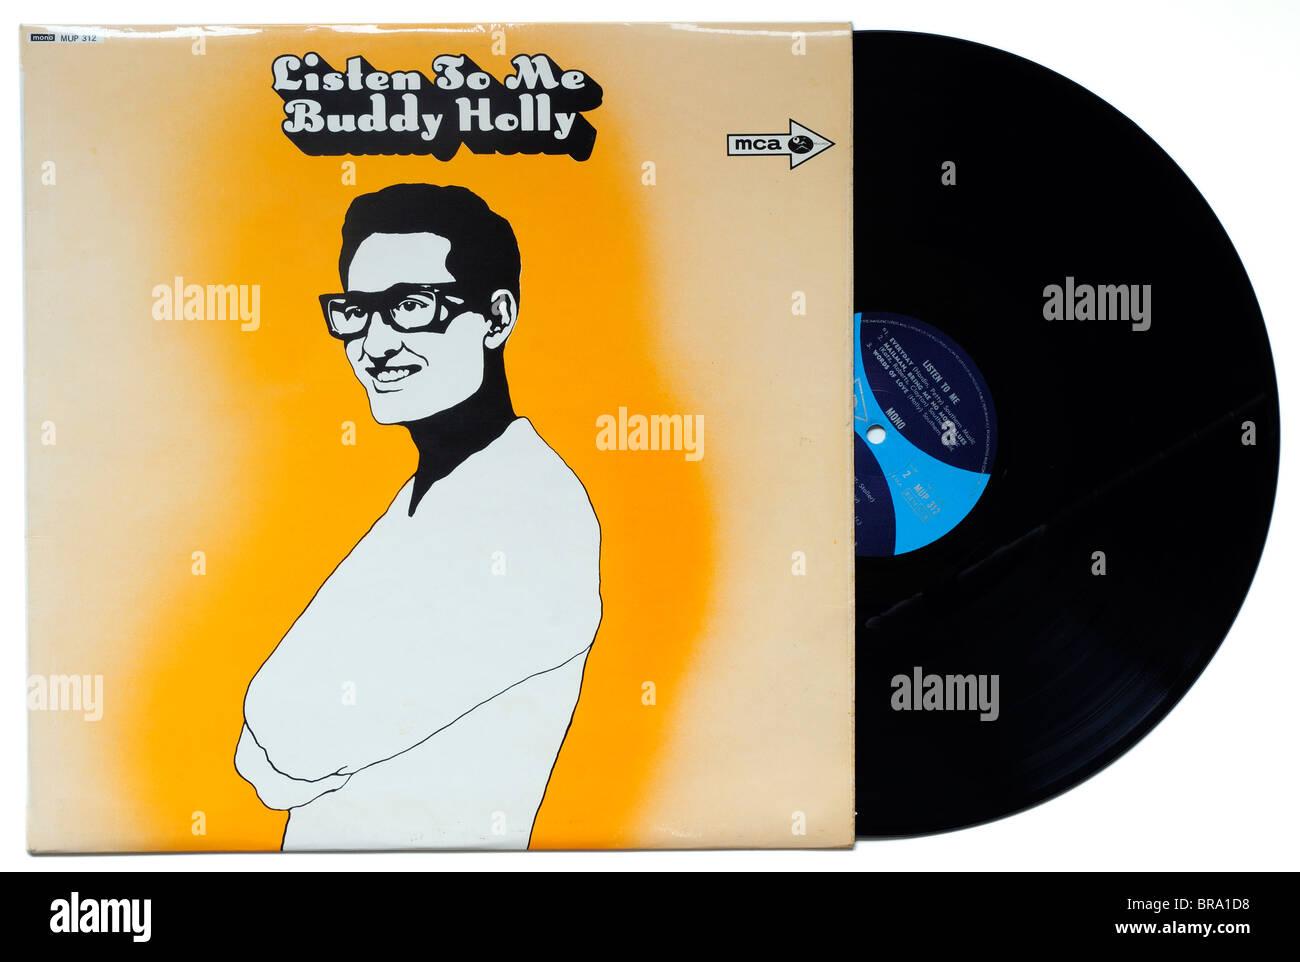 Buddy holly Listen to Me album - Stock Image